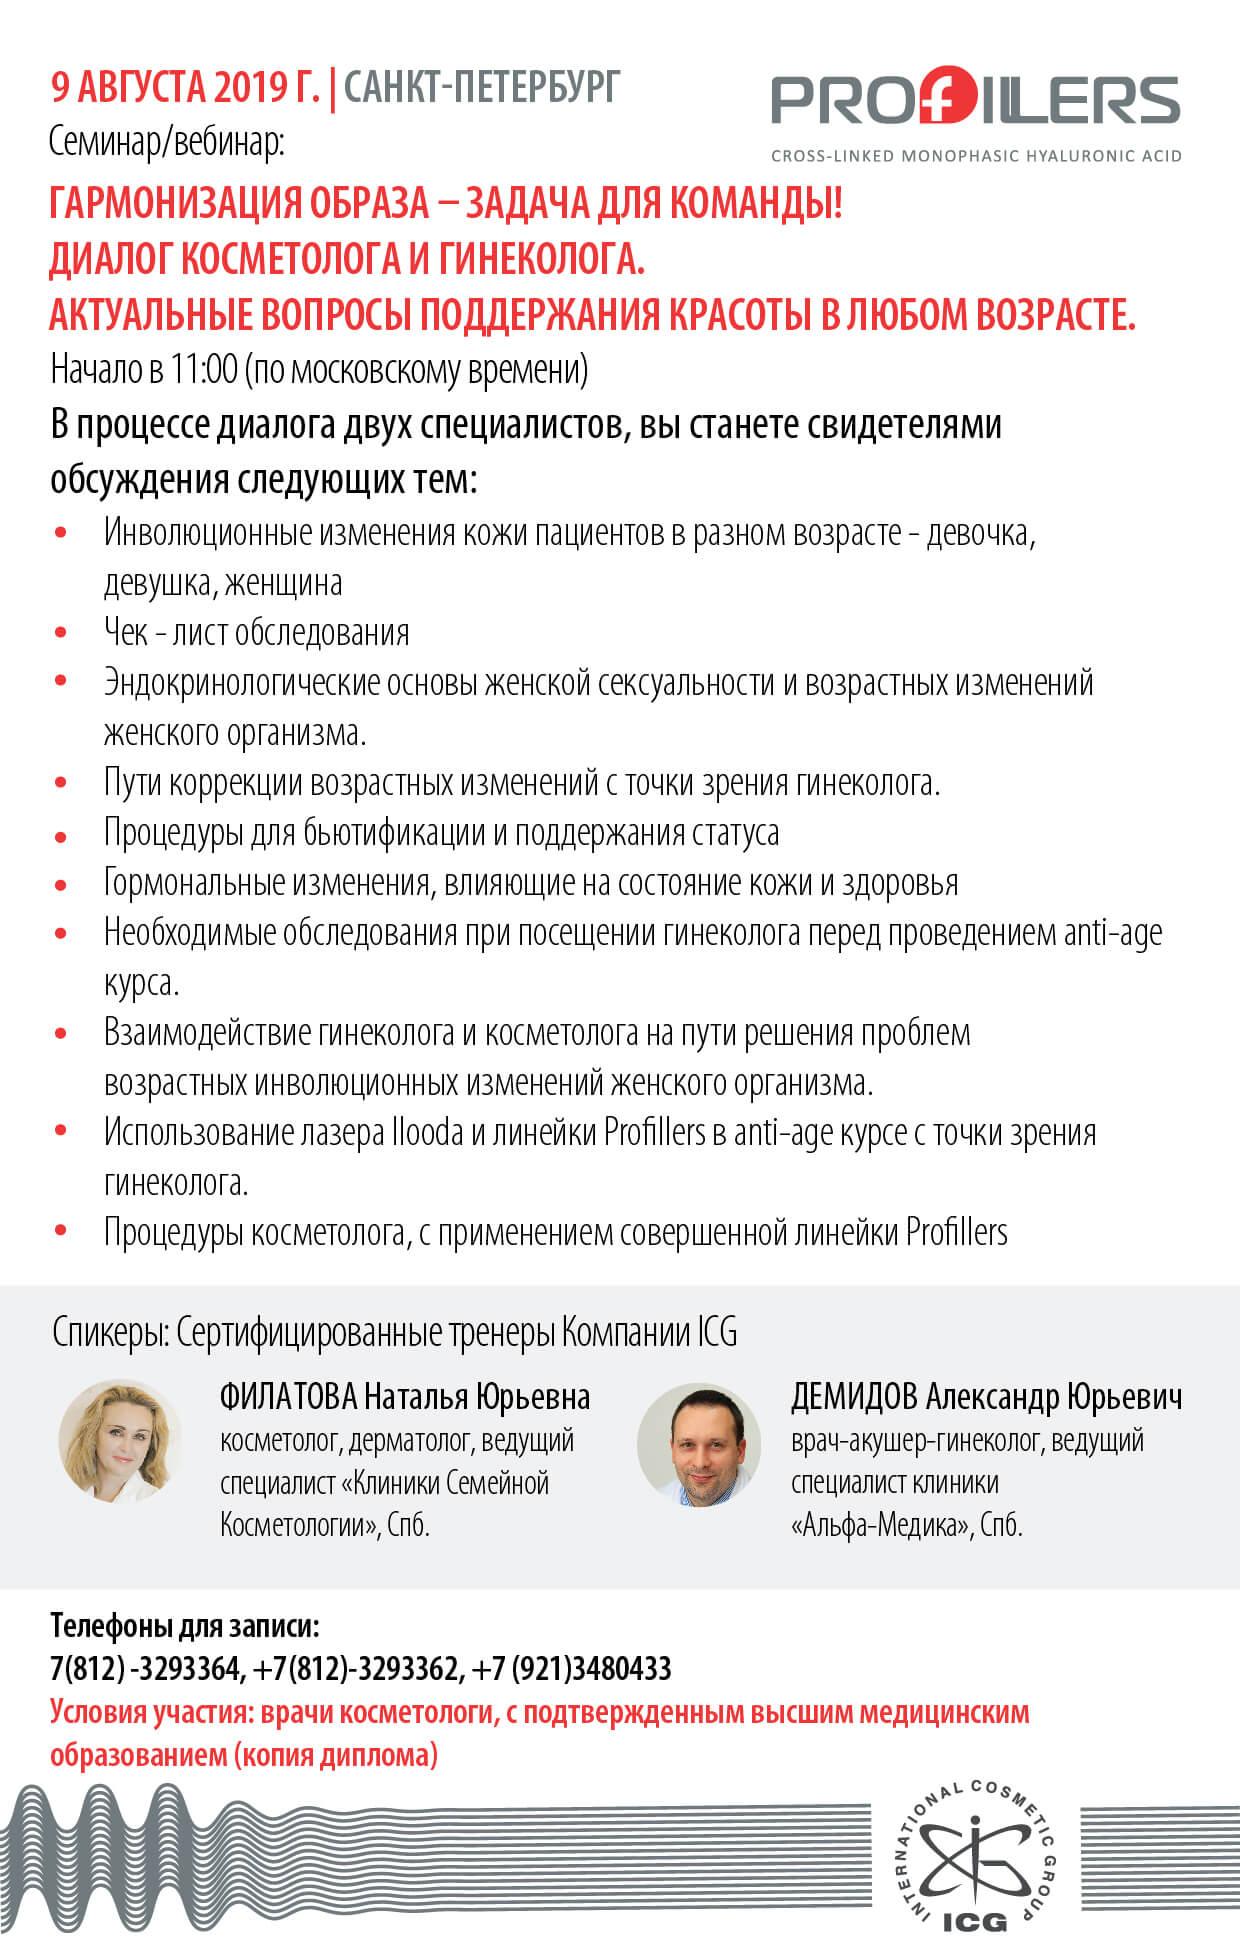 семинар-вебинар - диалог косметолога и гинеколога